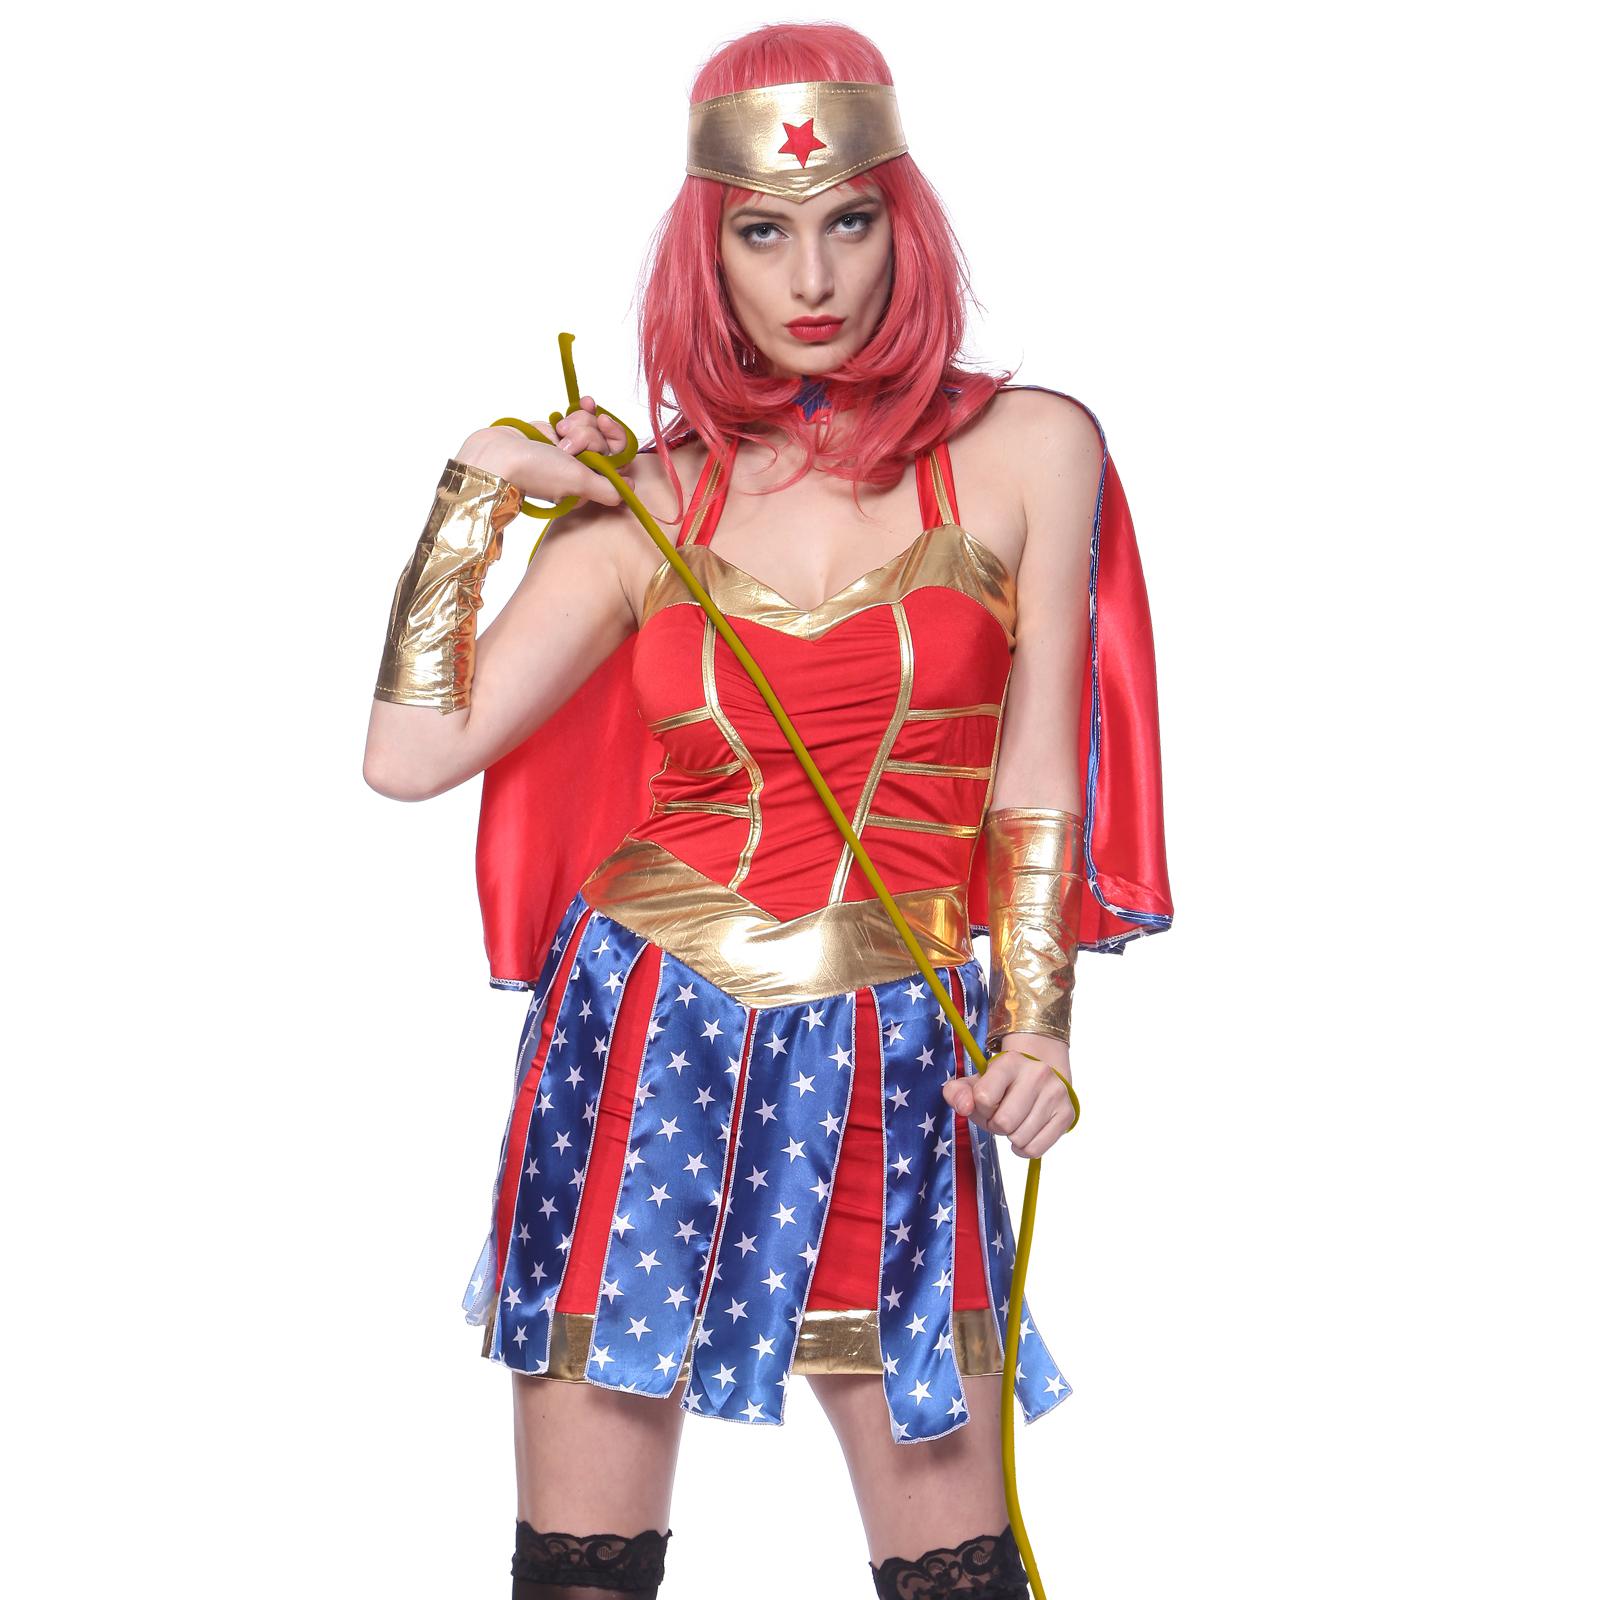 cotume deguisement wonder woman heroine superhero femme. Black Bedroom Furniture Sets. Home Design Ideas